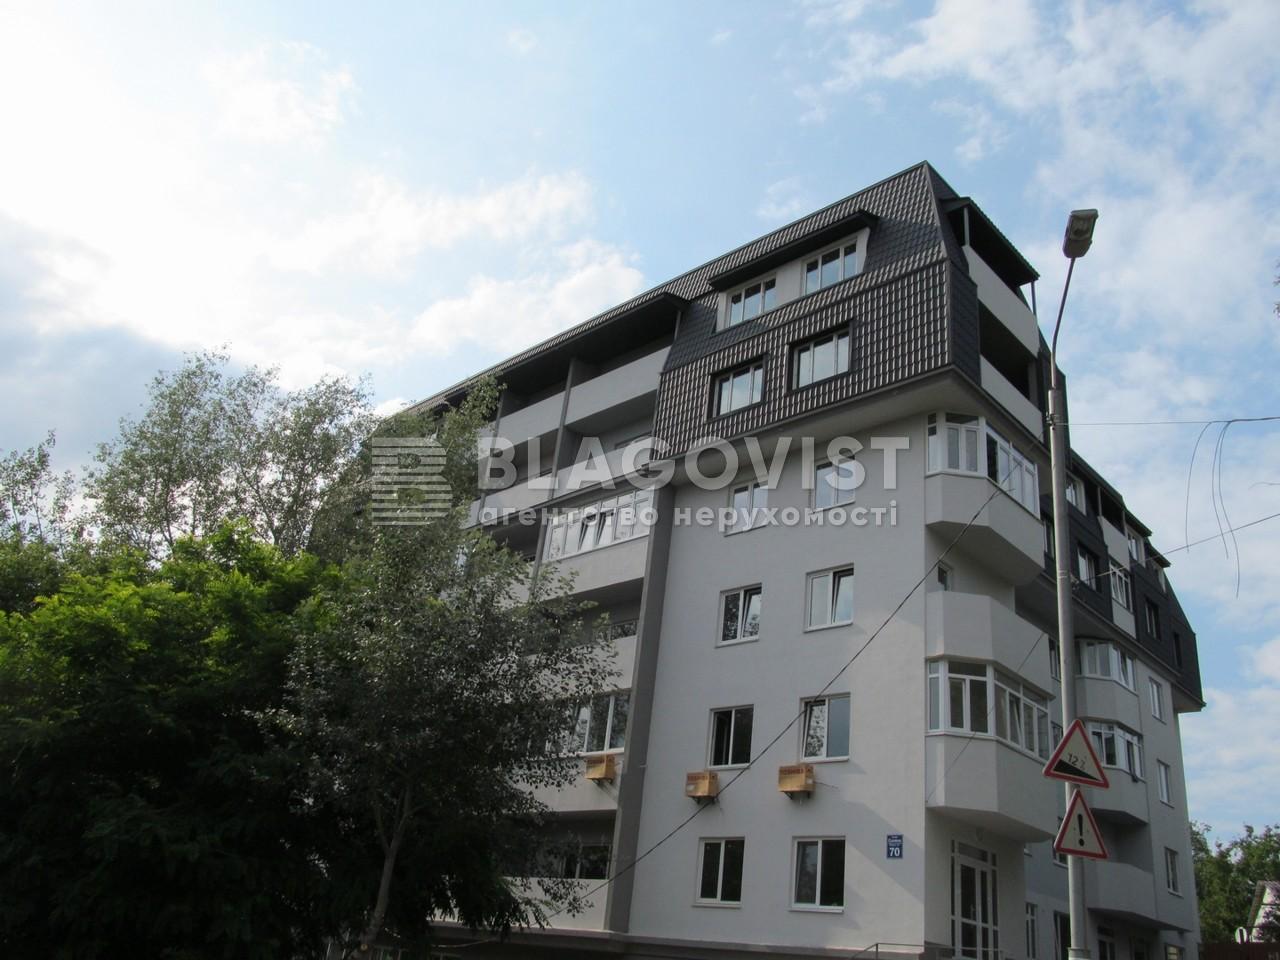 Нежитлове приміщення, A-110627, Соляна, Київ - Фото 3